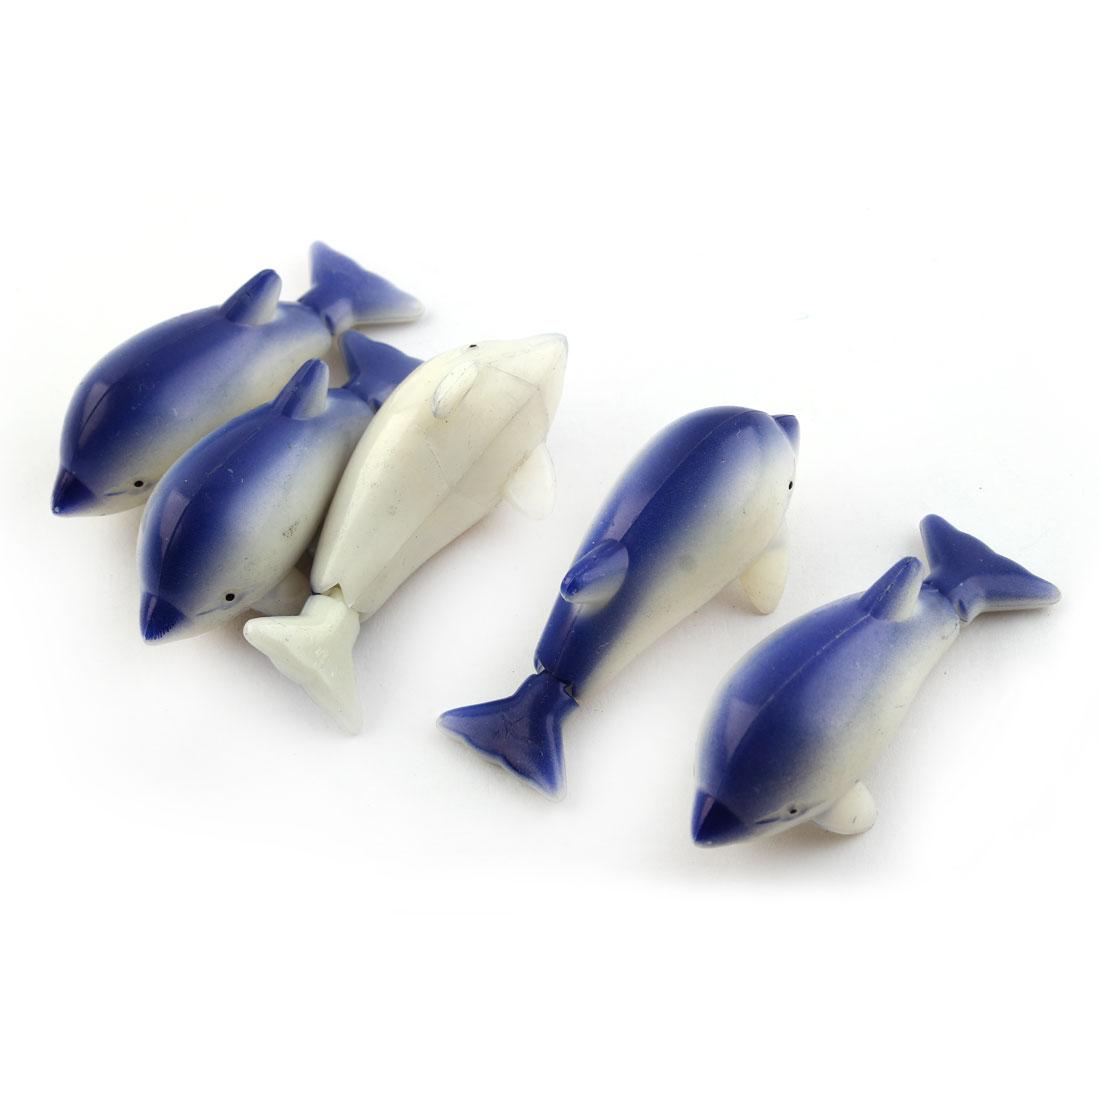 Aquarium Fish Tank Mini Plastic Floating Dolphin Decorate Ornament Blue 5 Pcs